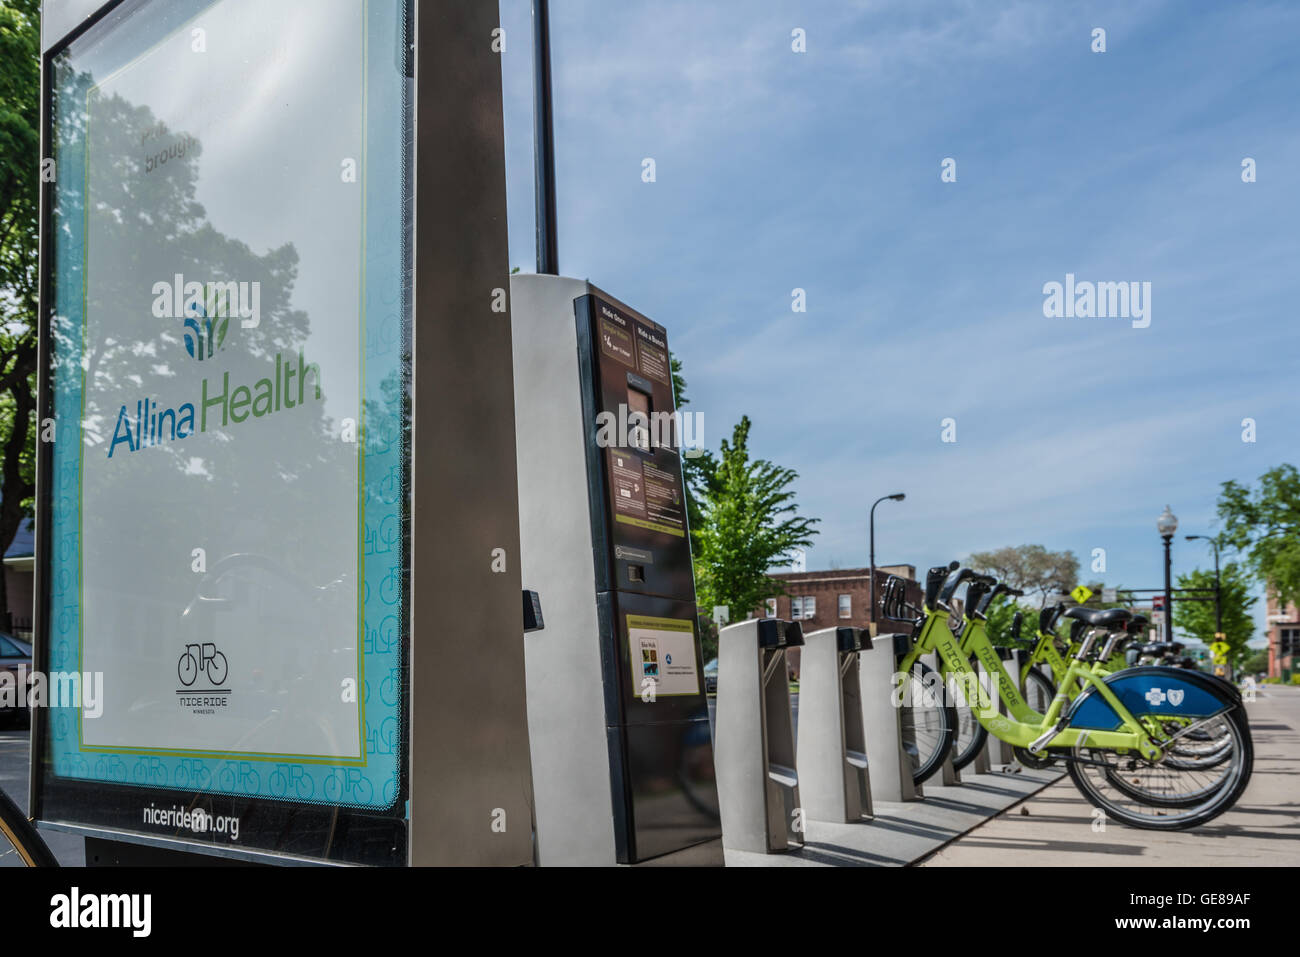 Nice Ride Minneapolis Bike Share Program - Abbott Station